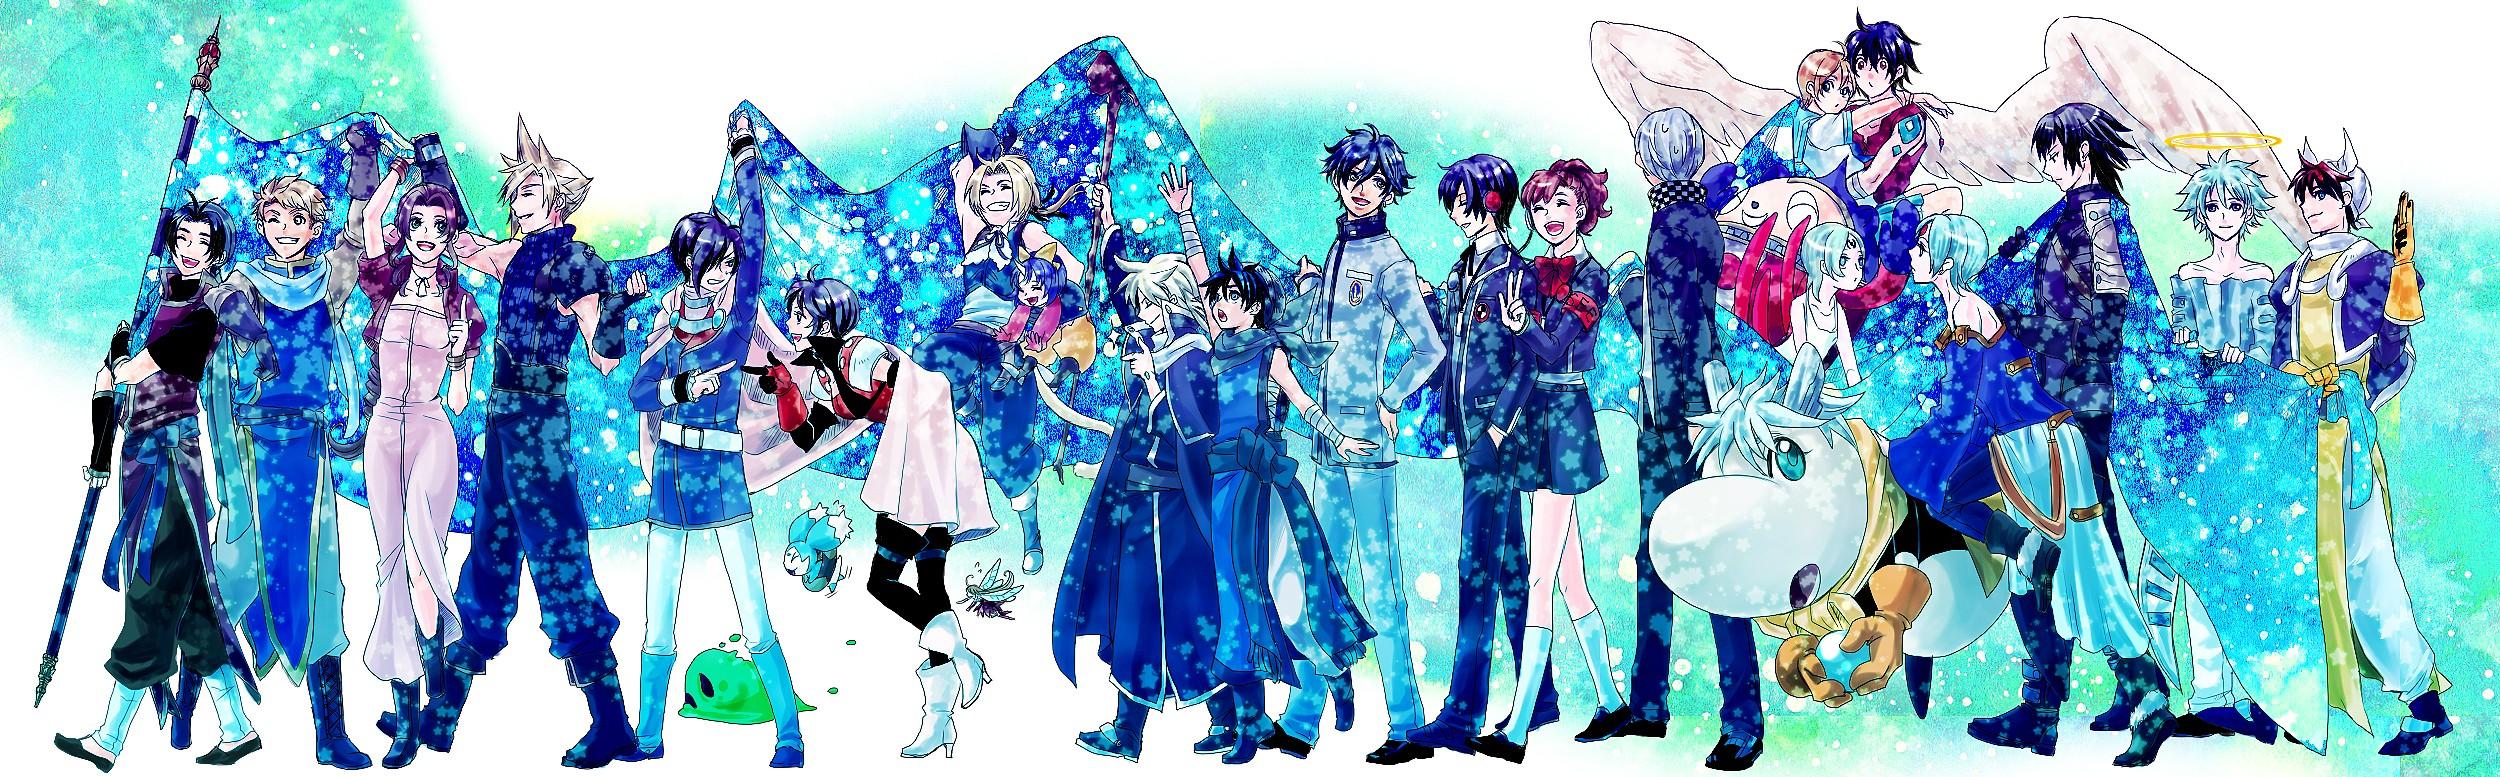 Persona Wallpapers Wallpaper 2500x777